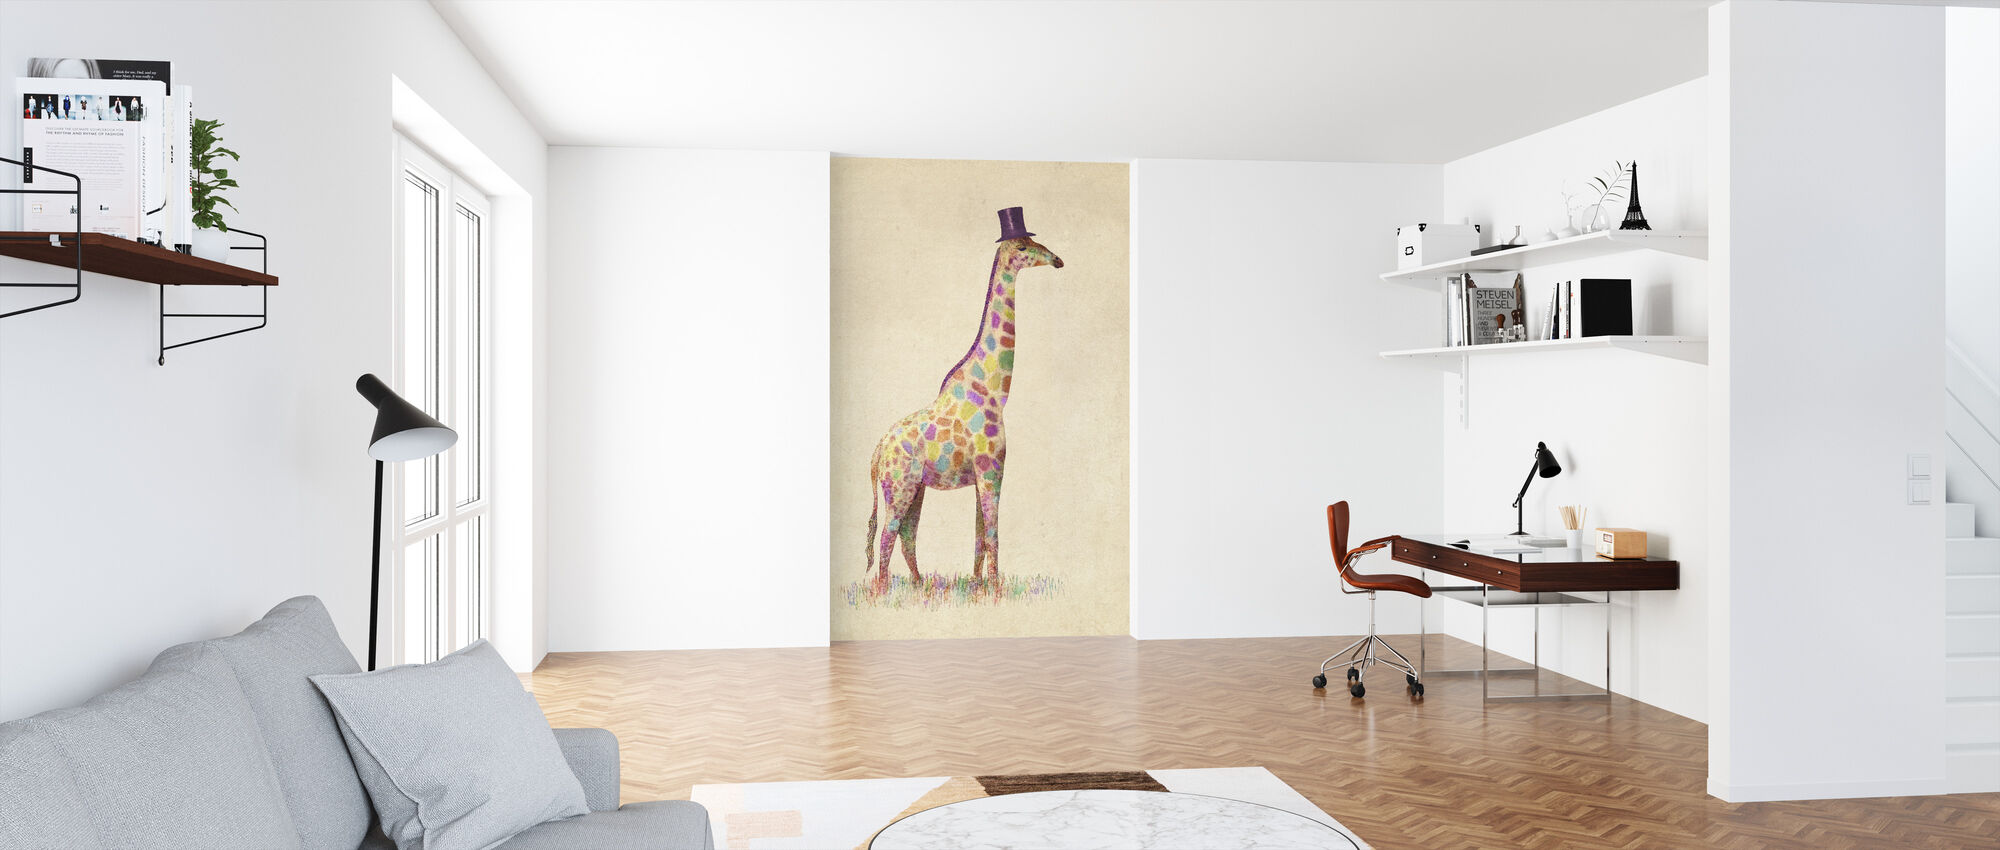 Fashionable Giraffe - Wallpaper - Office